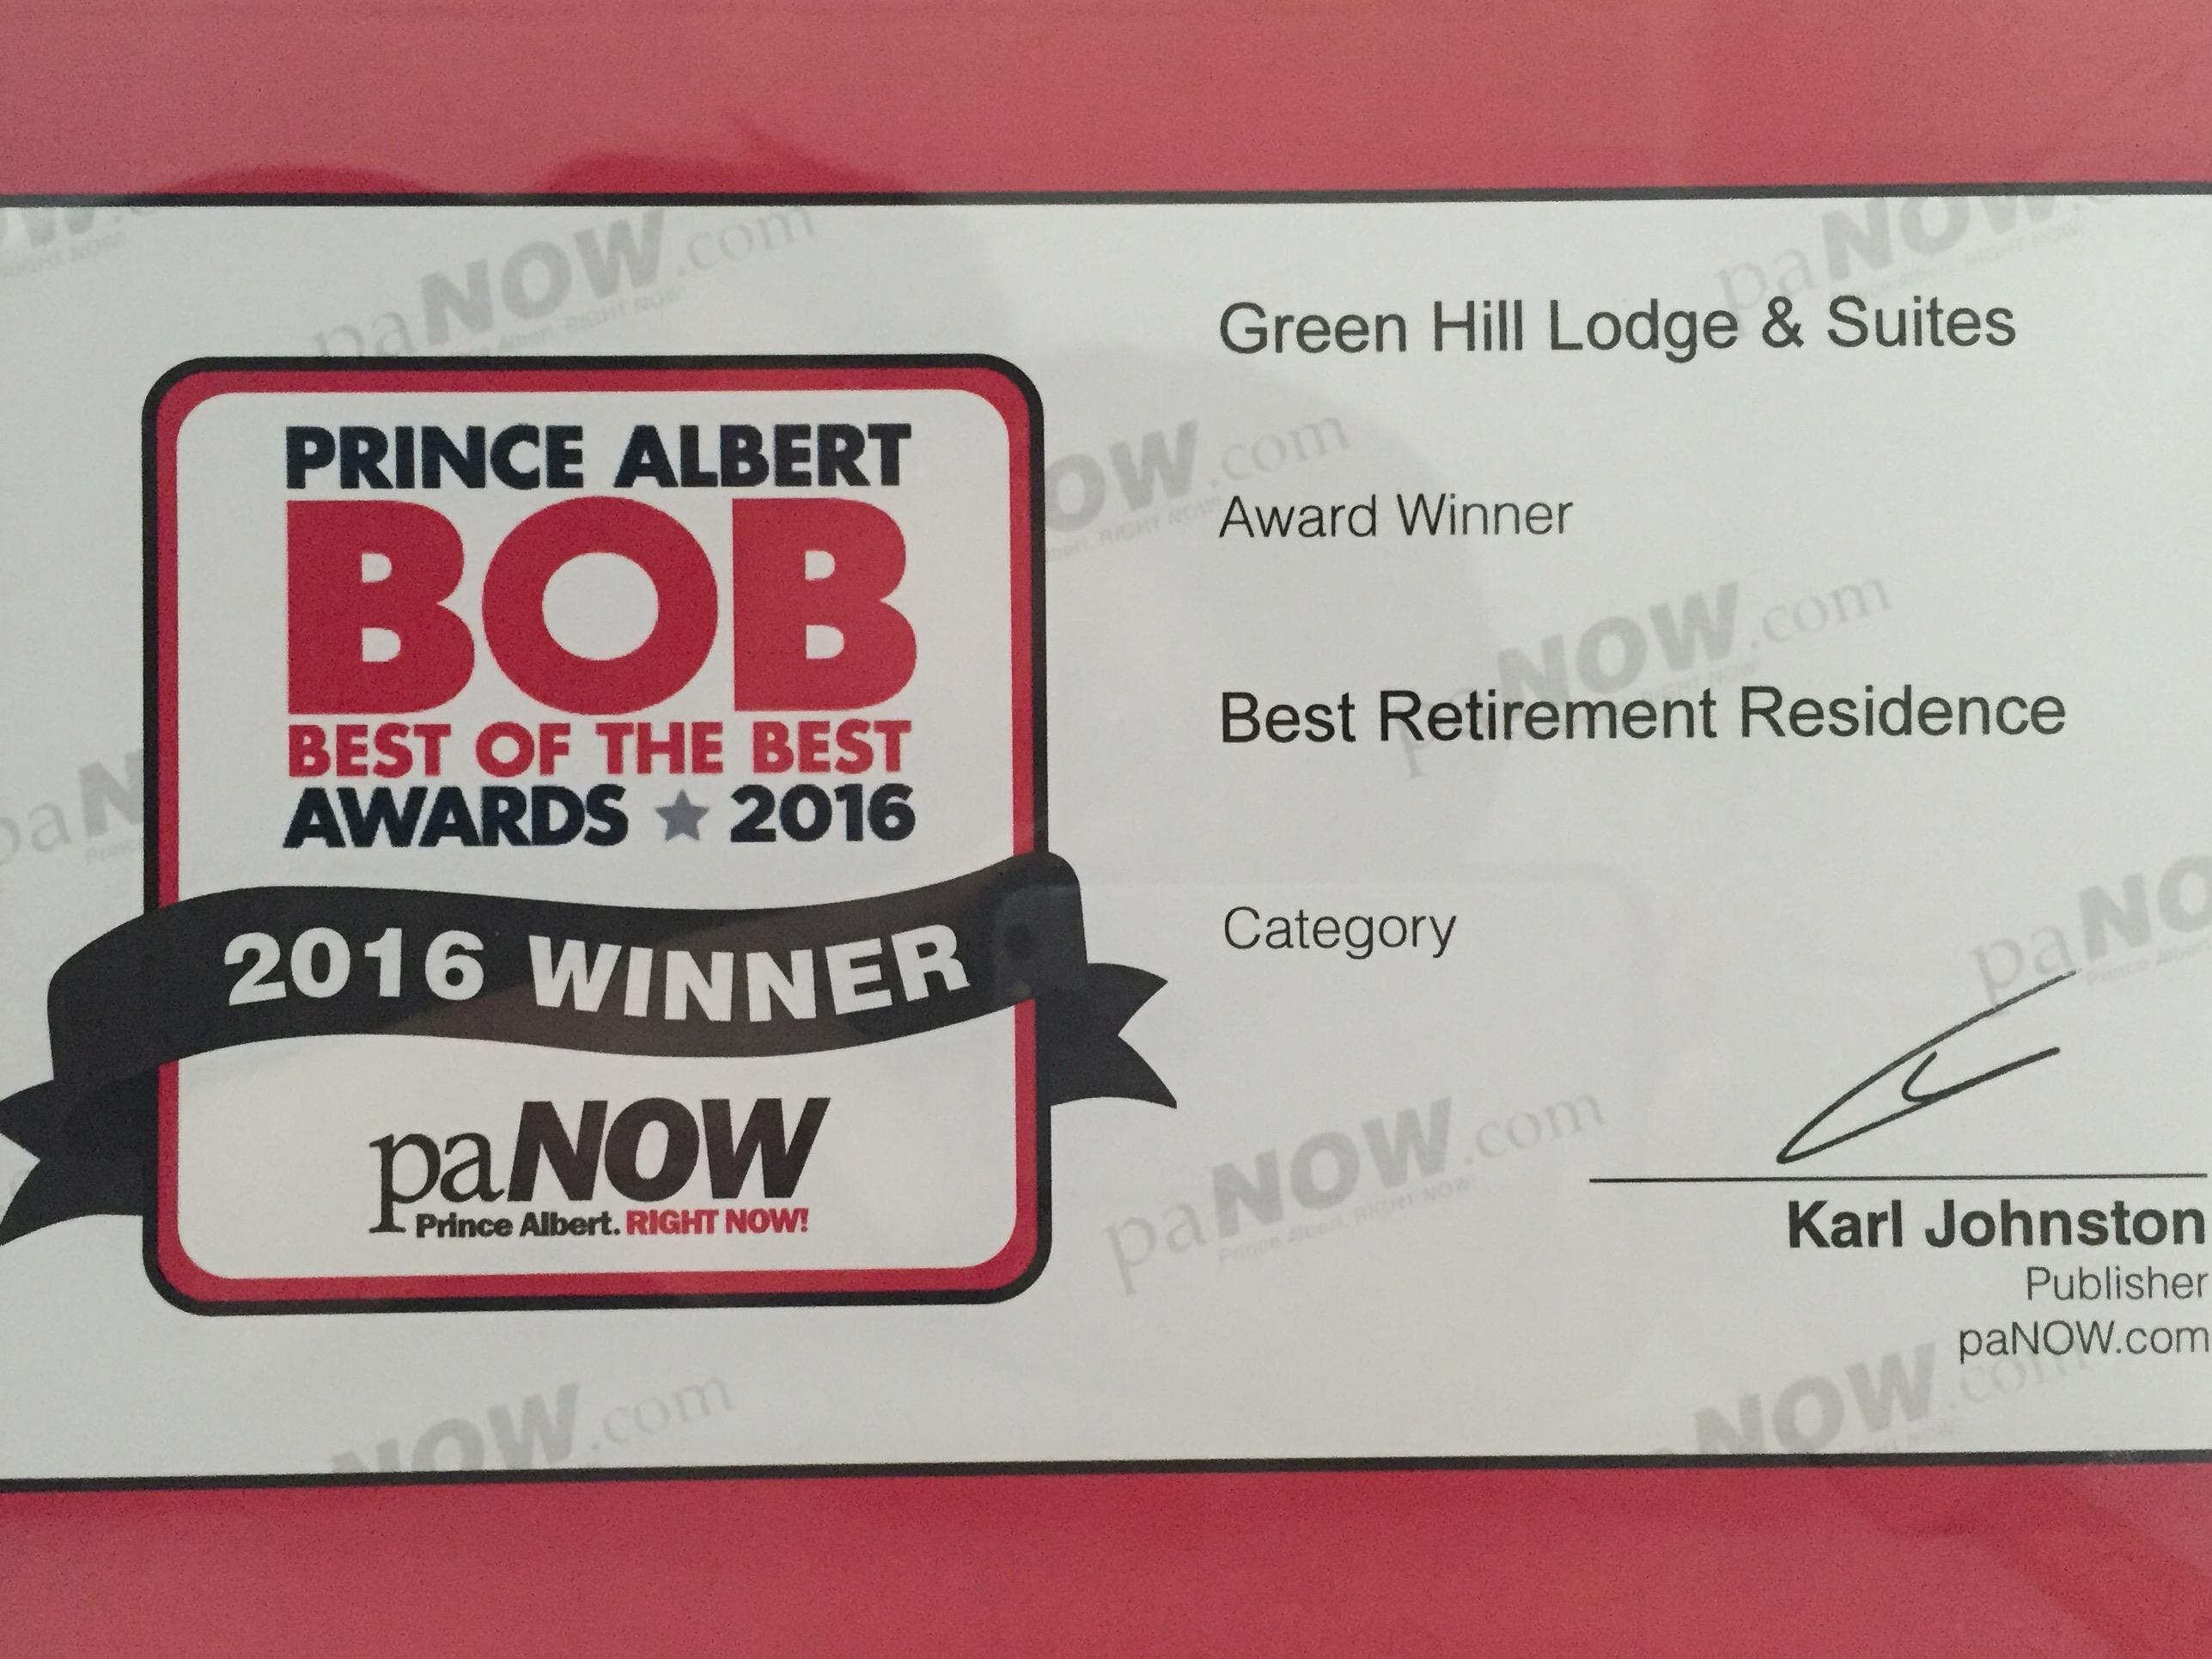 Best of the Best award 2016